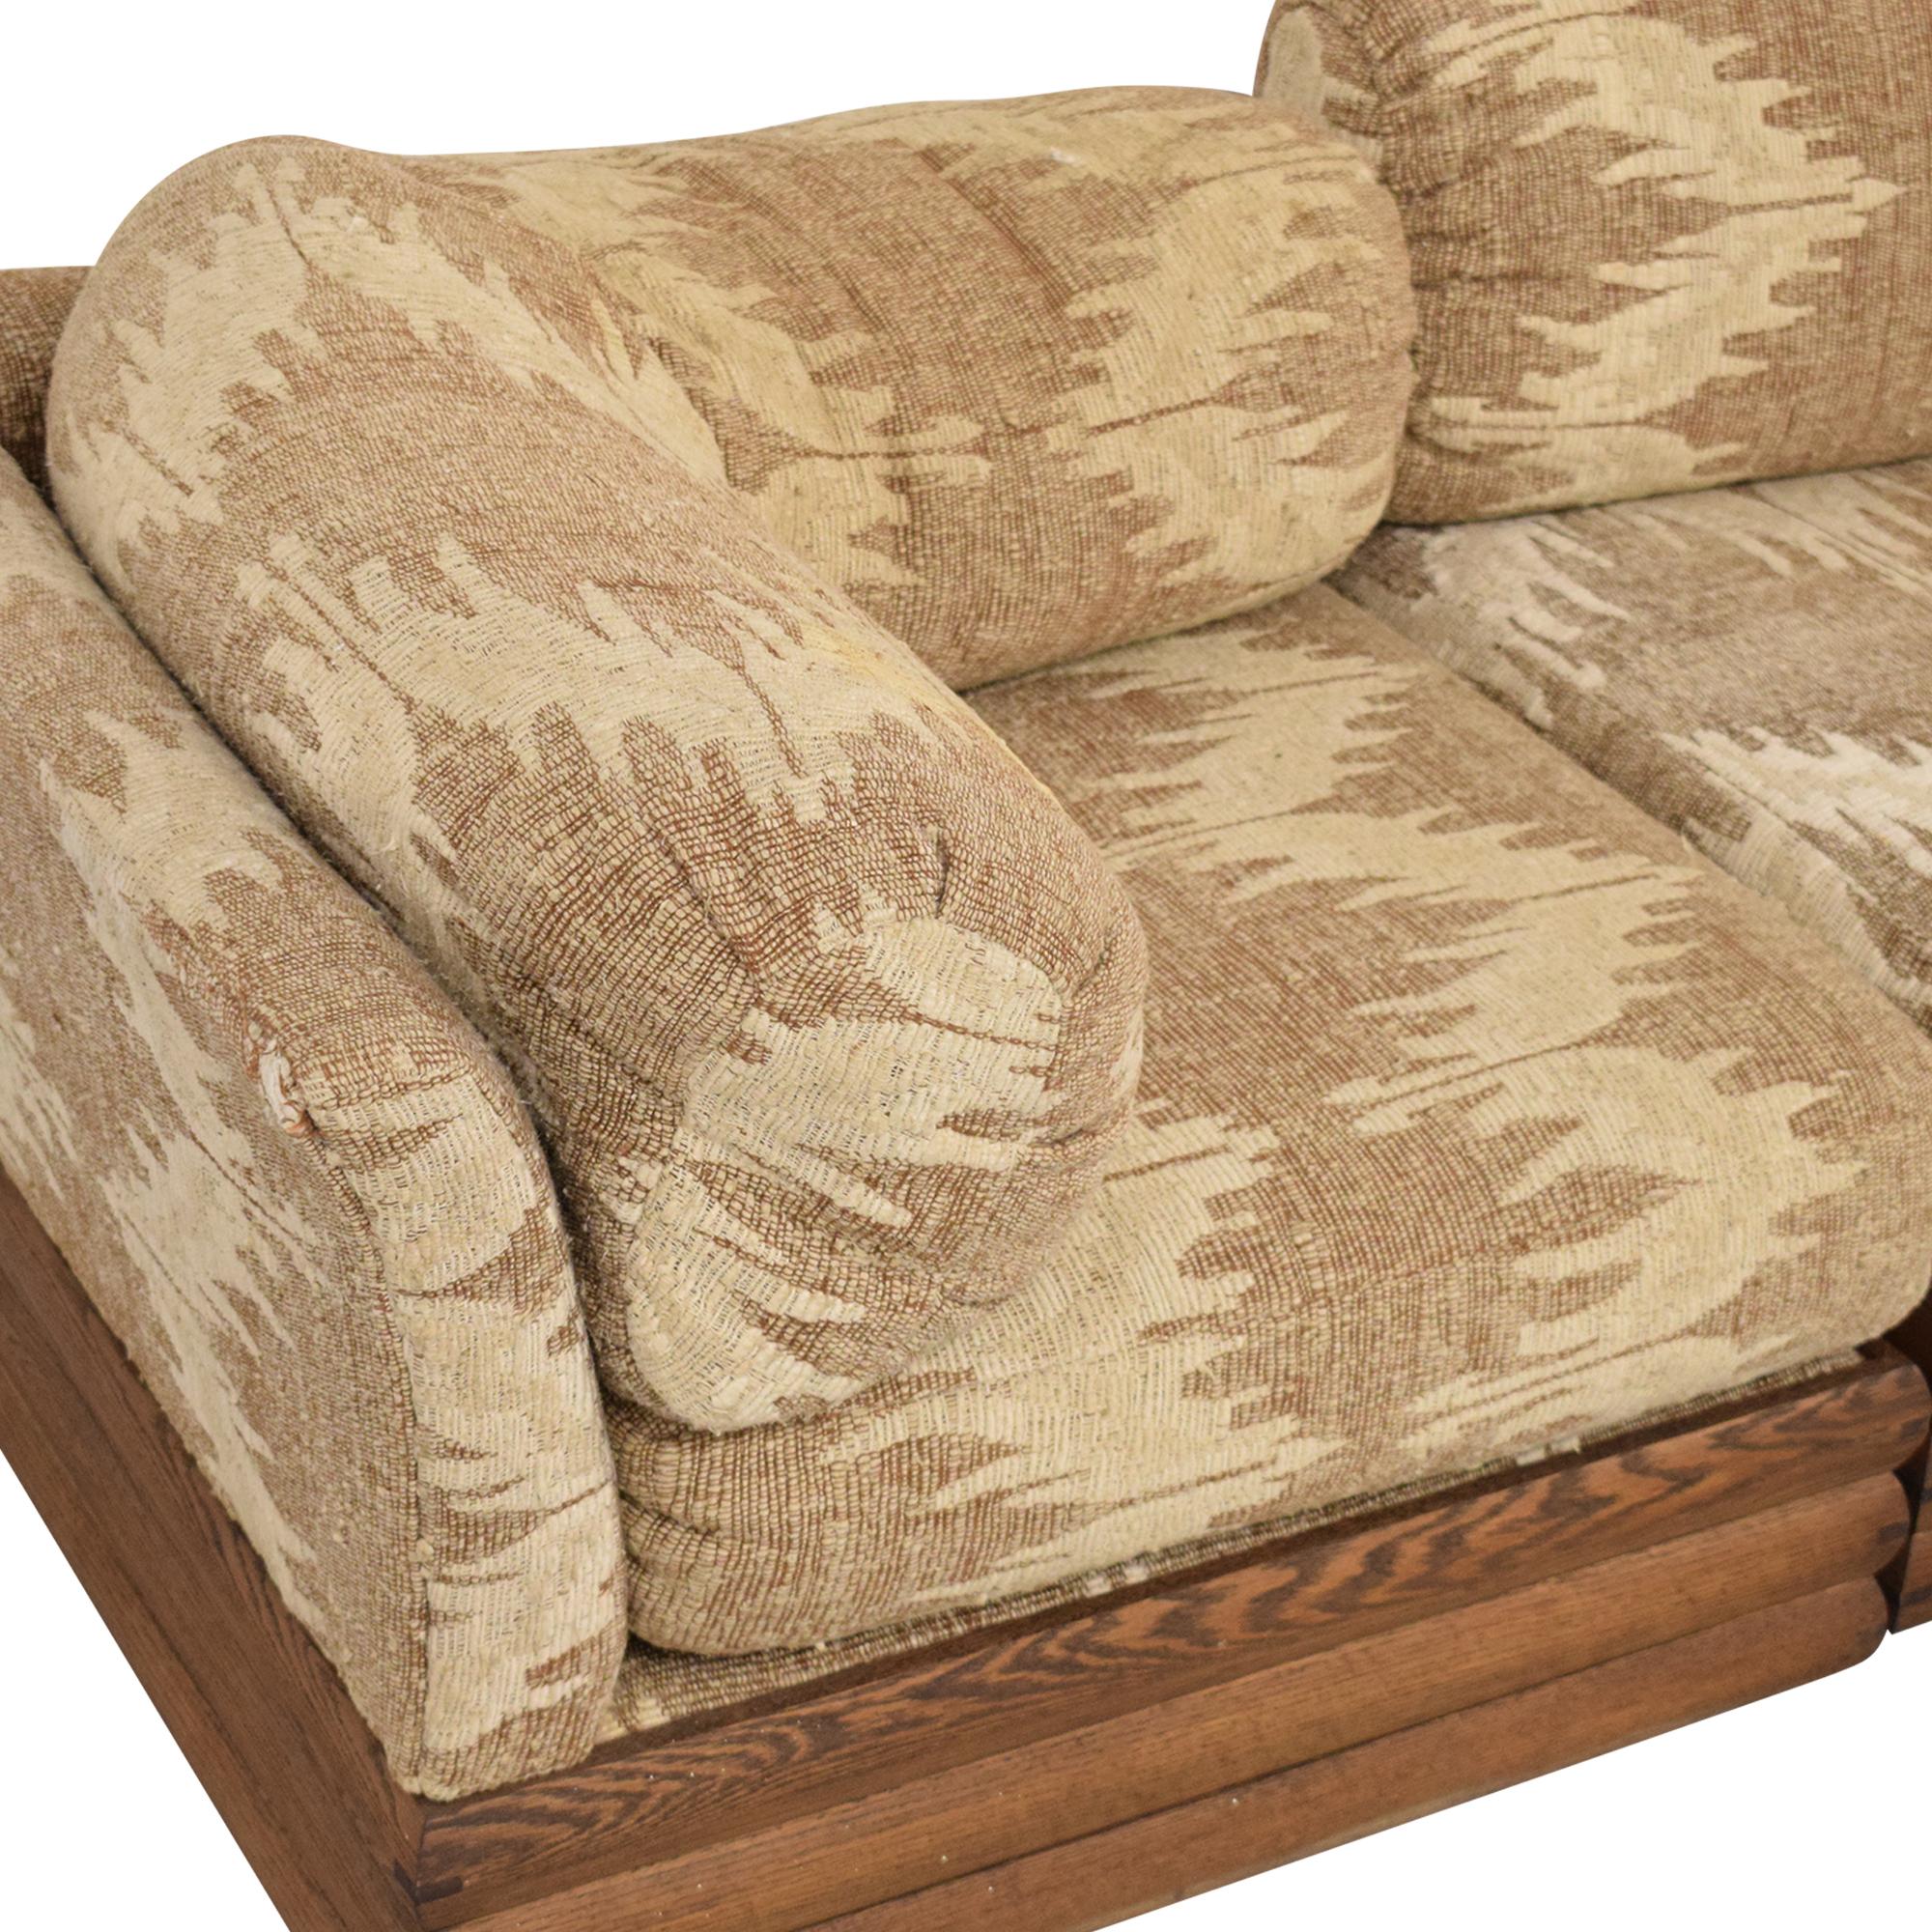 Royal Lounge Royal Lounge Sectional Sofa with Corner Table used